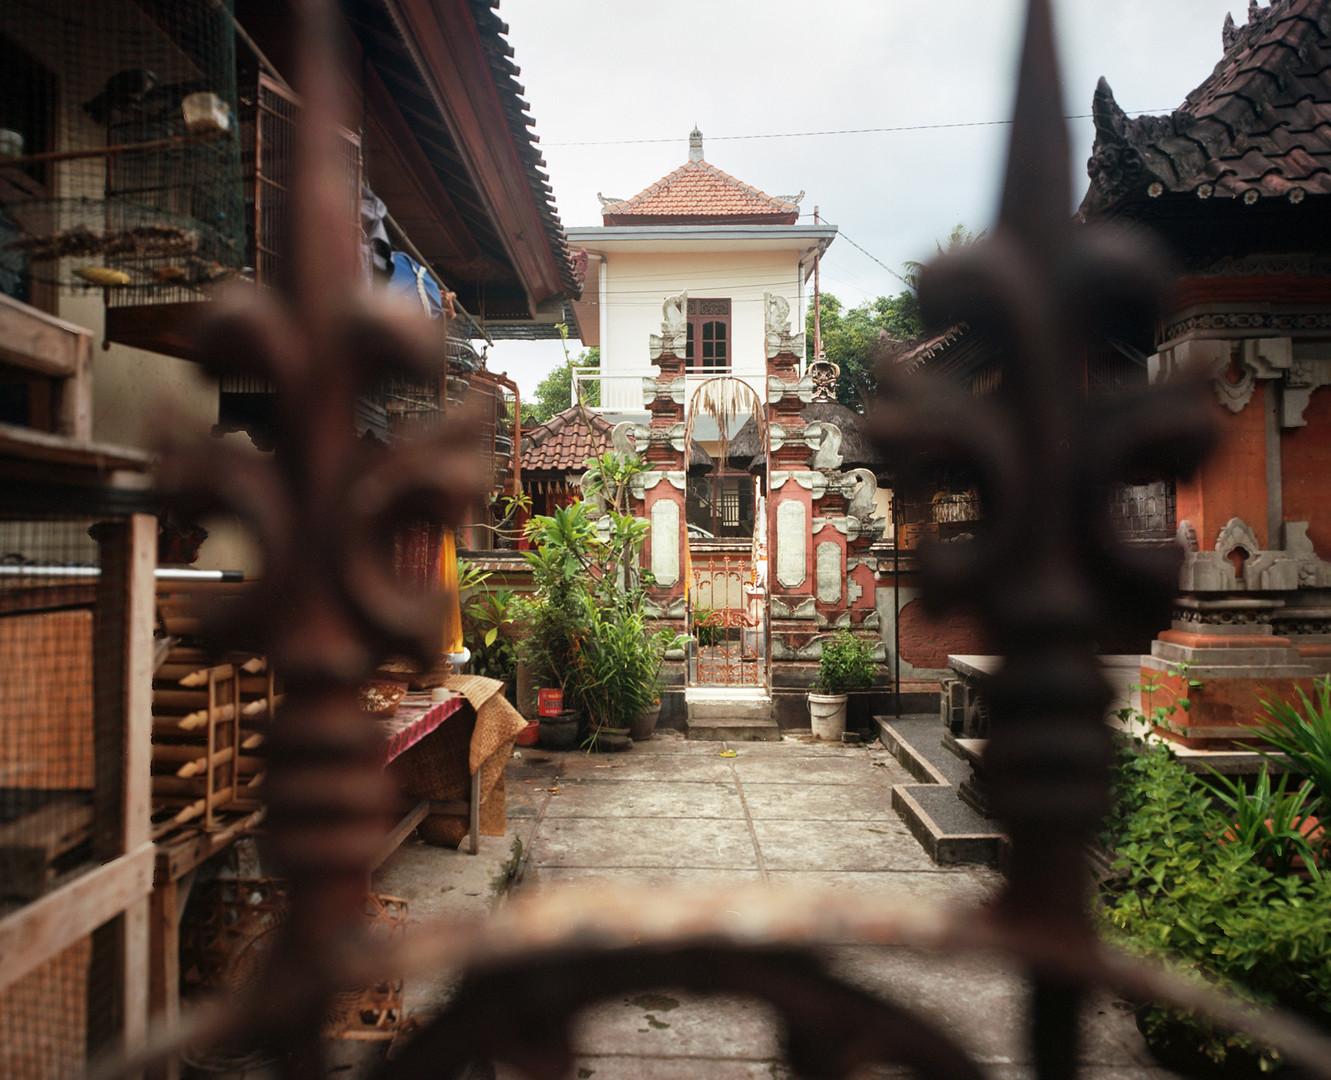 Goodman-zone-camera-shots-Bali-2.jpg